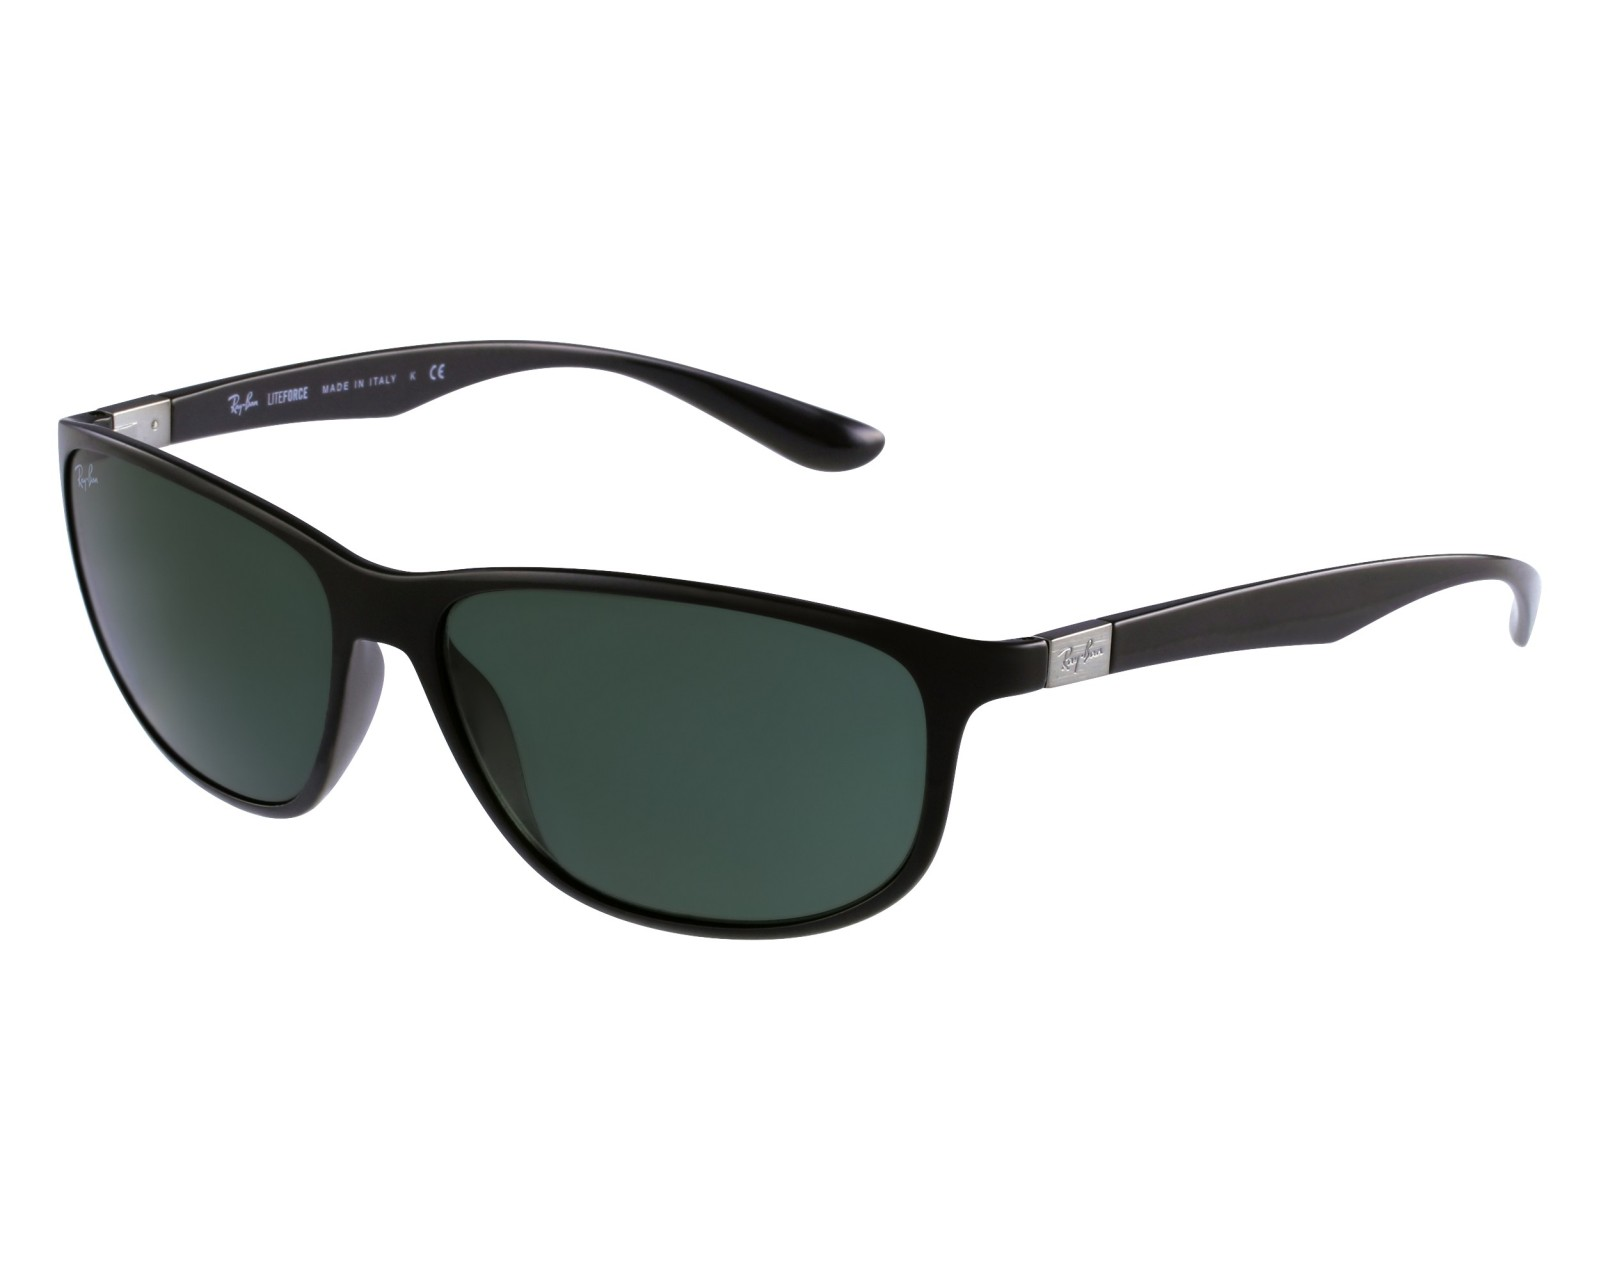 0f166758e6d thumbnail Sunglasses Ray-Ban RB-4213 601 71 - Black front view